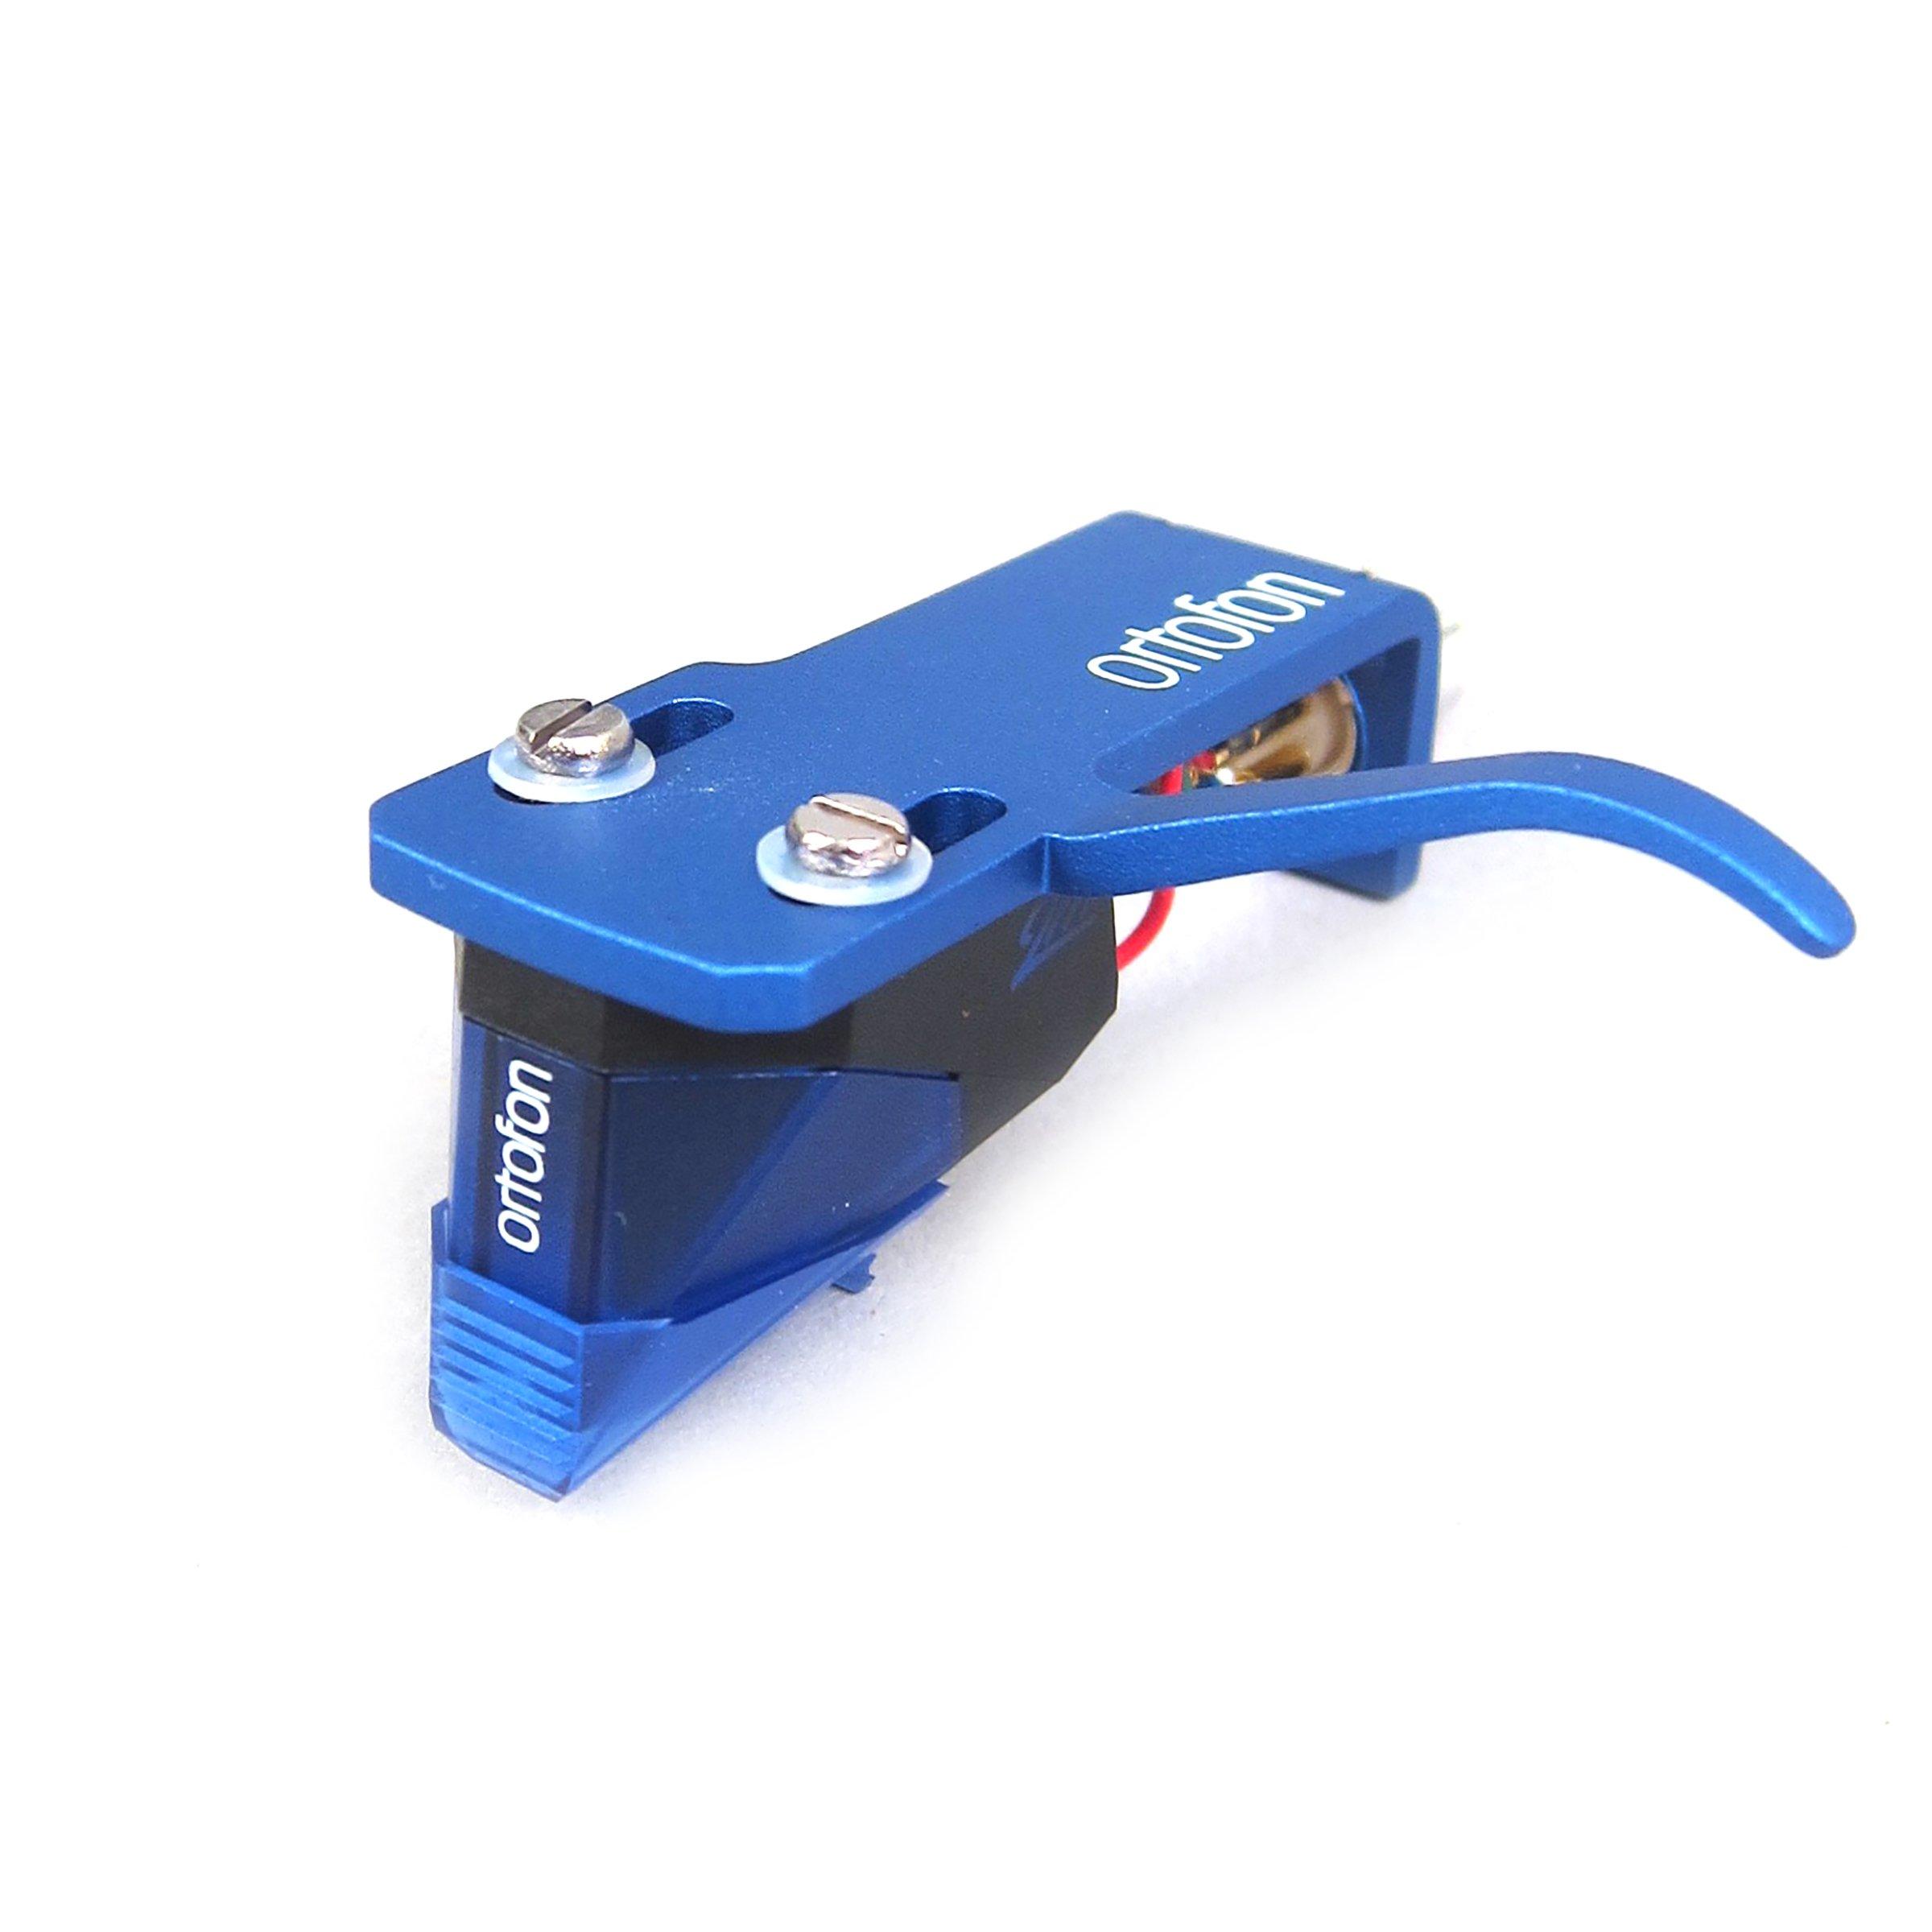 Ortofon: 2M Blue Cartridge Mounted on SH-4 Headshell by Ortofon